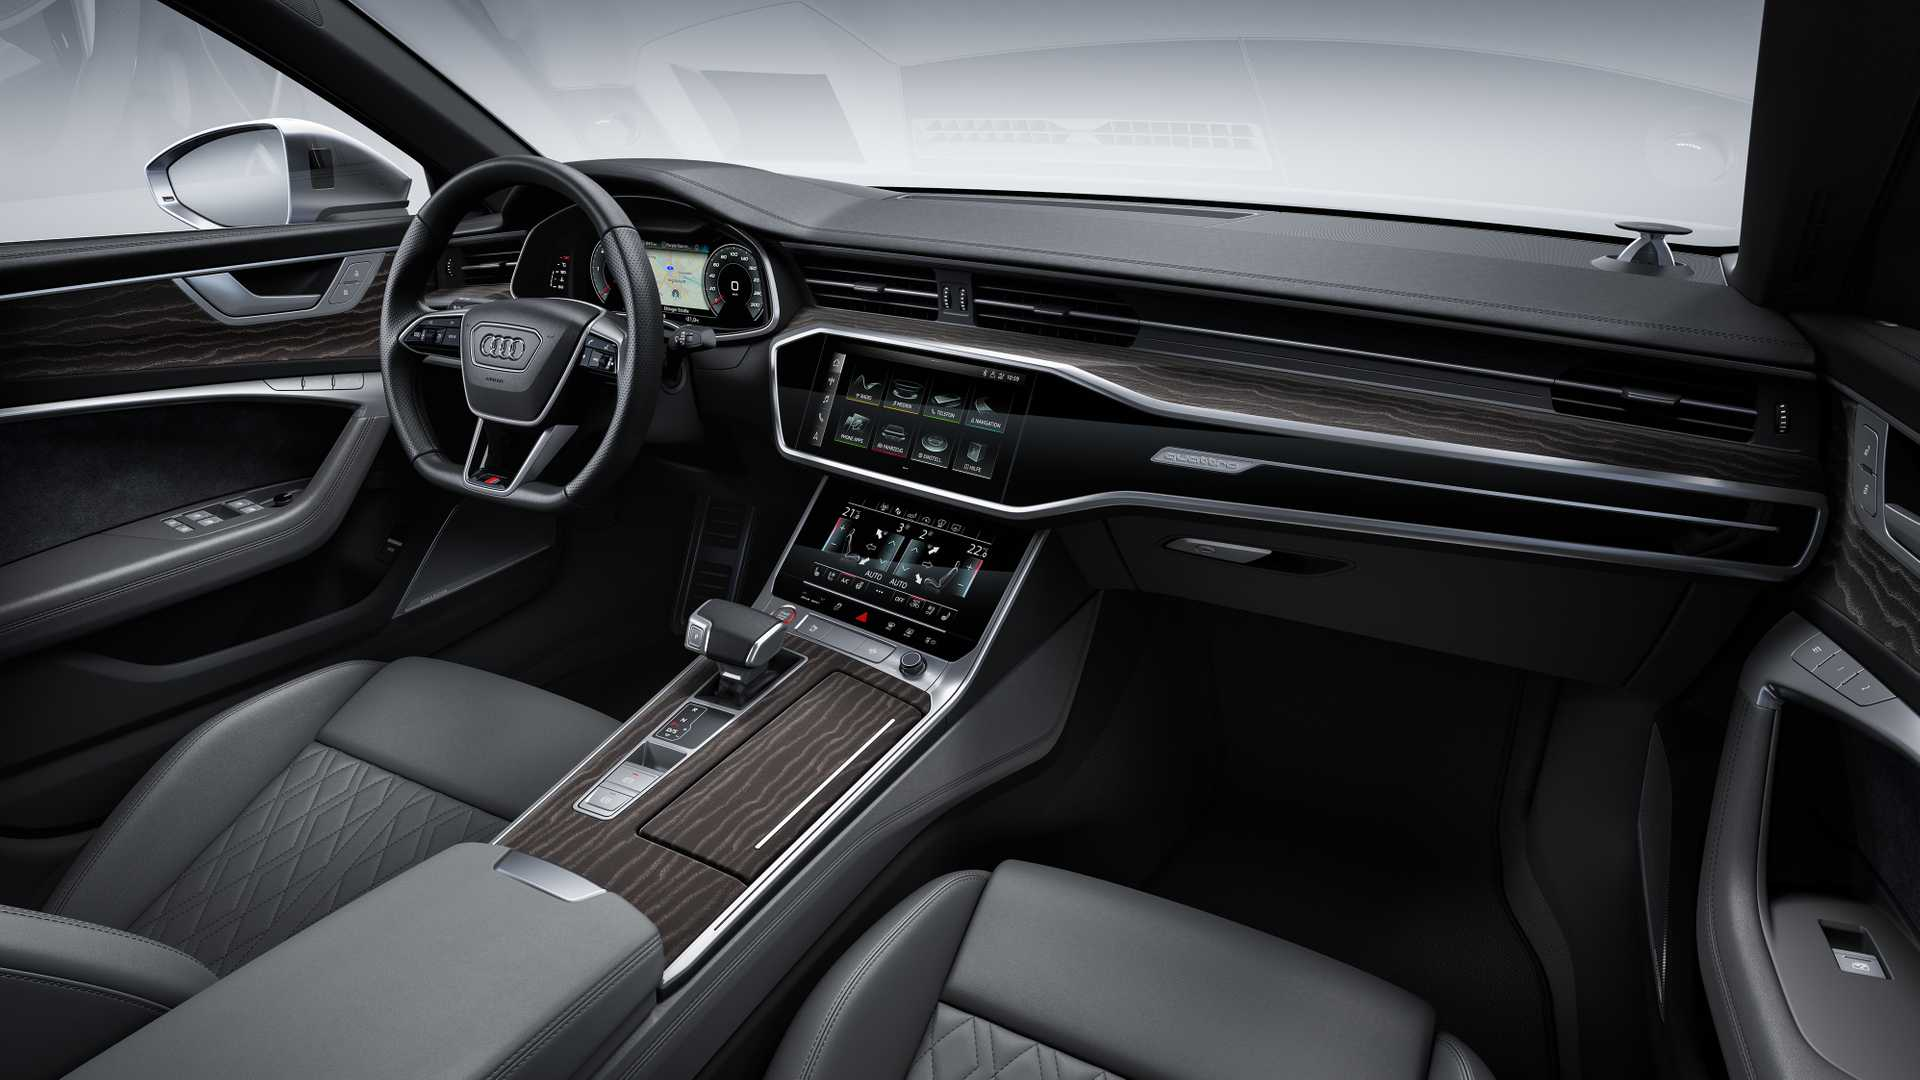 2020-audi-s6-sedan-tdi (11)